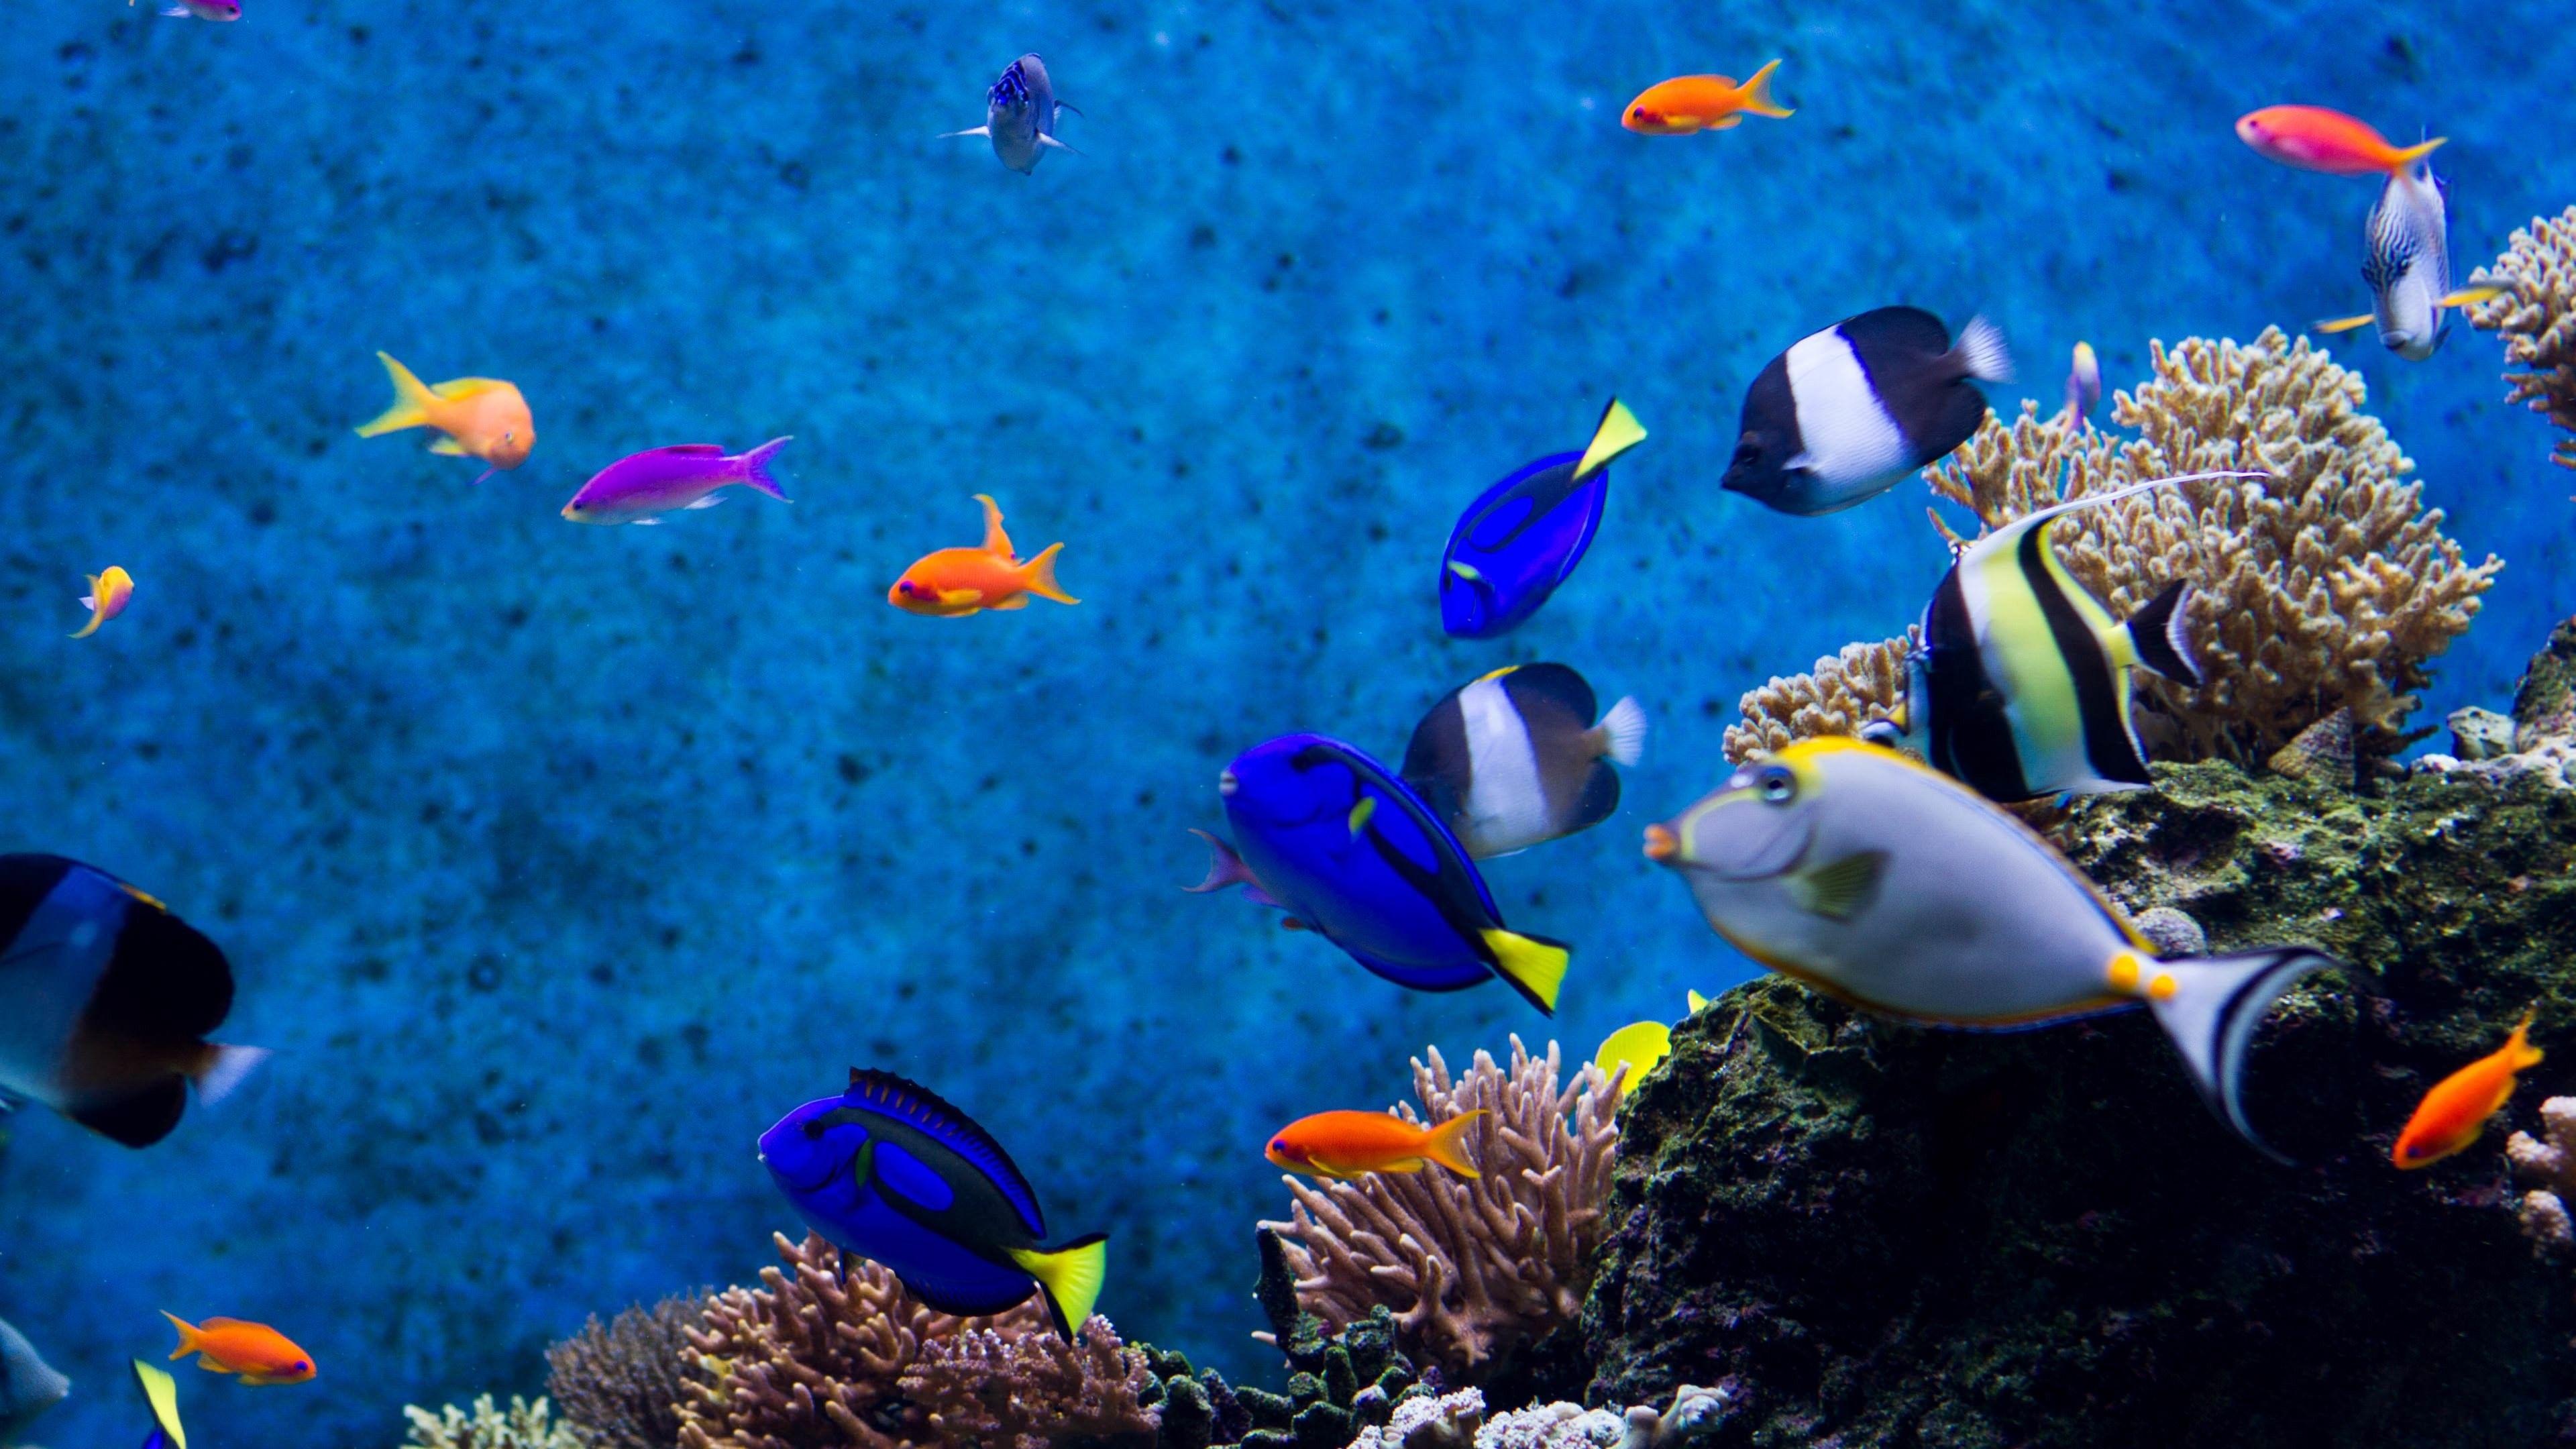 55 Moving Aquarium Wallpapers On Wallpaperplay Aquarium Live Wallpaper Aquarium Screensaver Wallpaper Windows 10